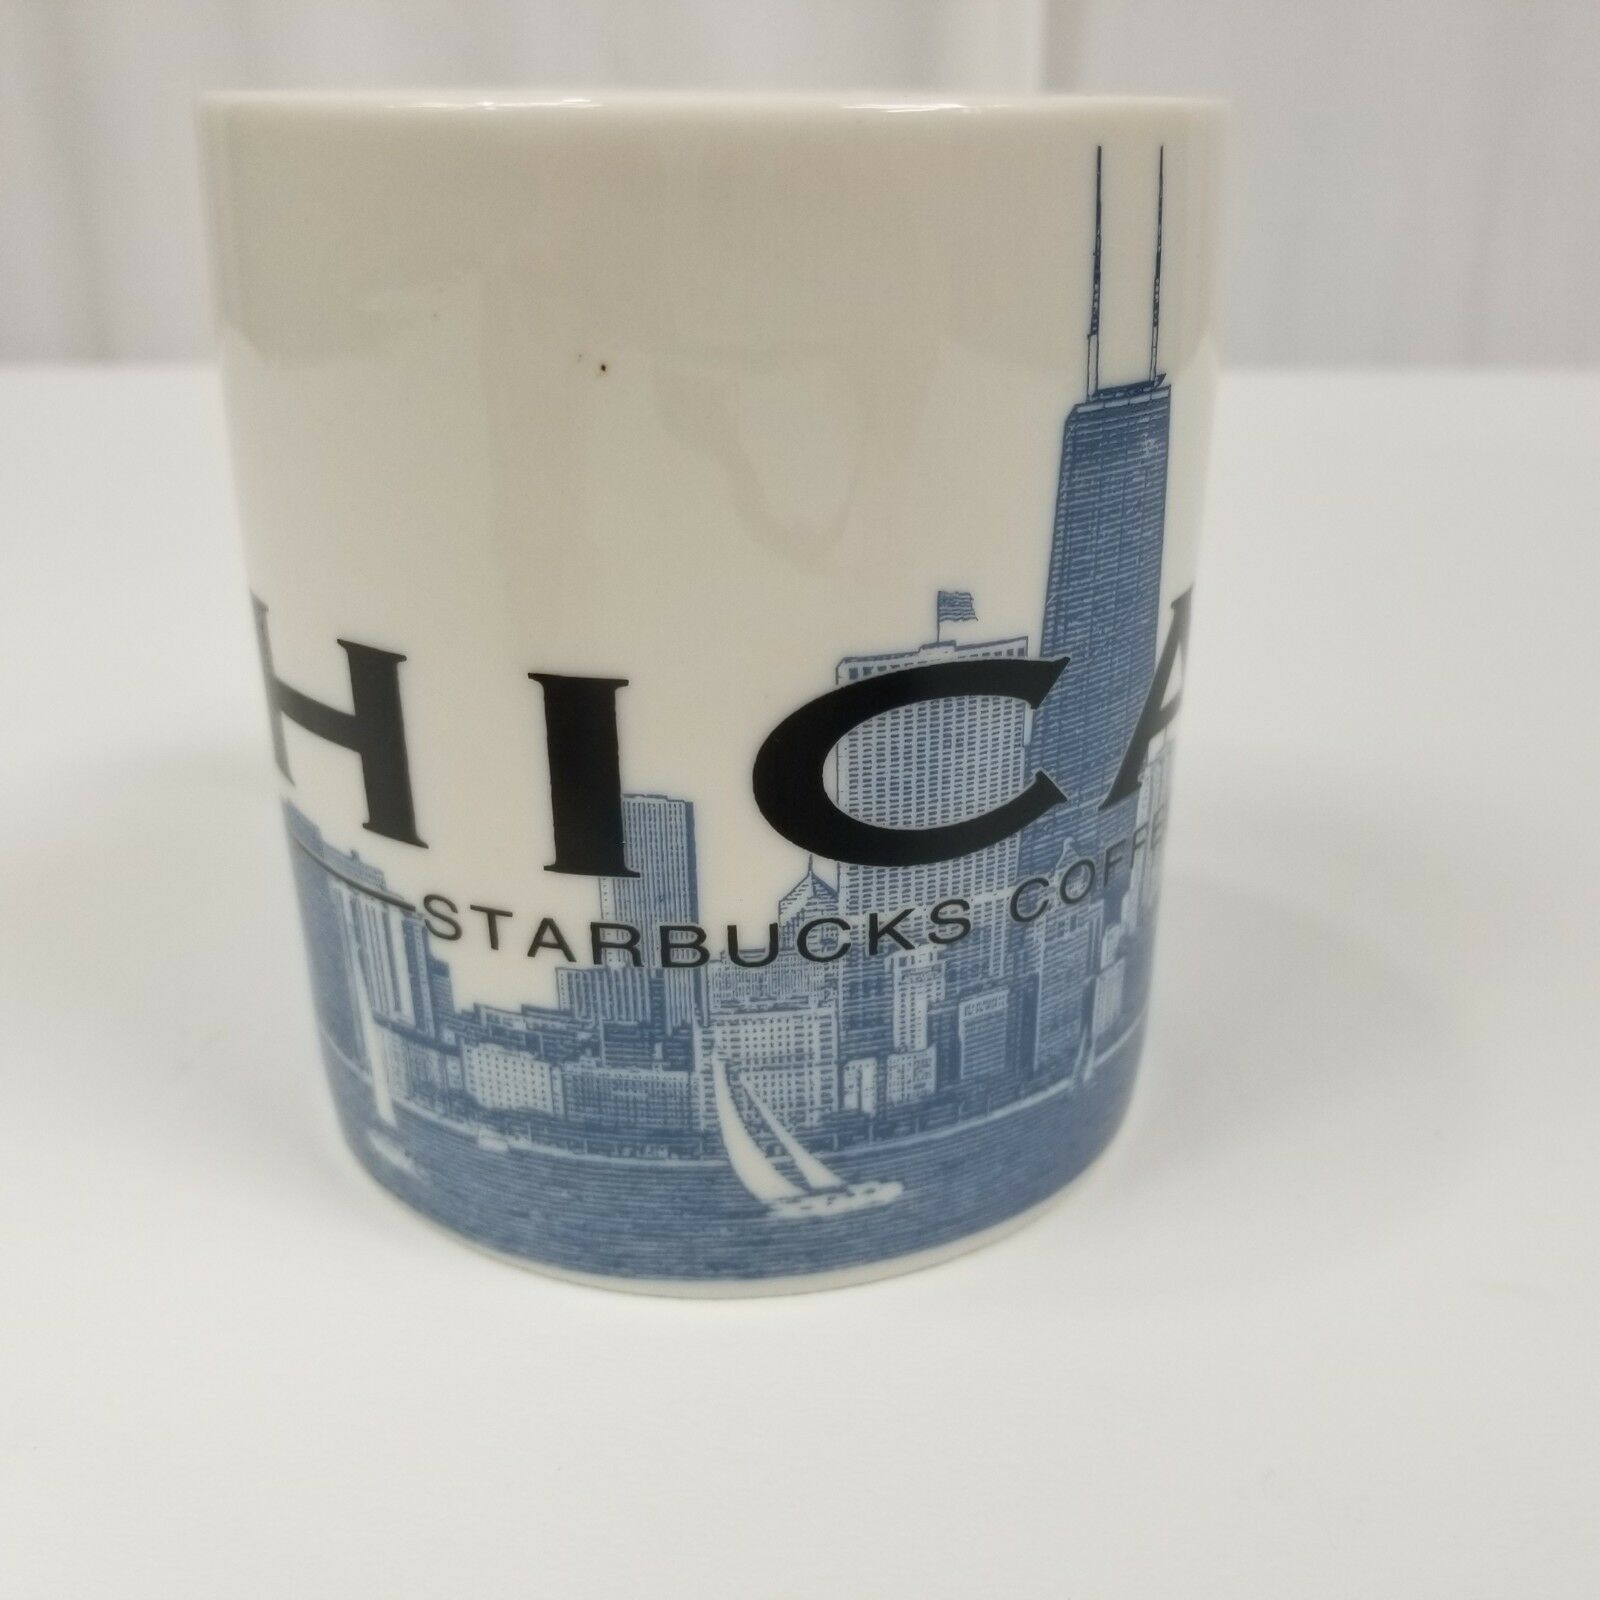 Starbucks Chicago Skyline Series Mug Coffee Cup Tea Large Windy City Barista image 5